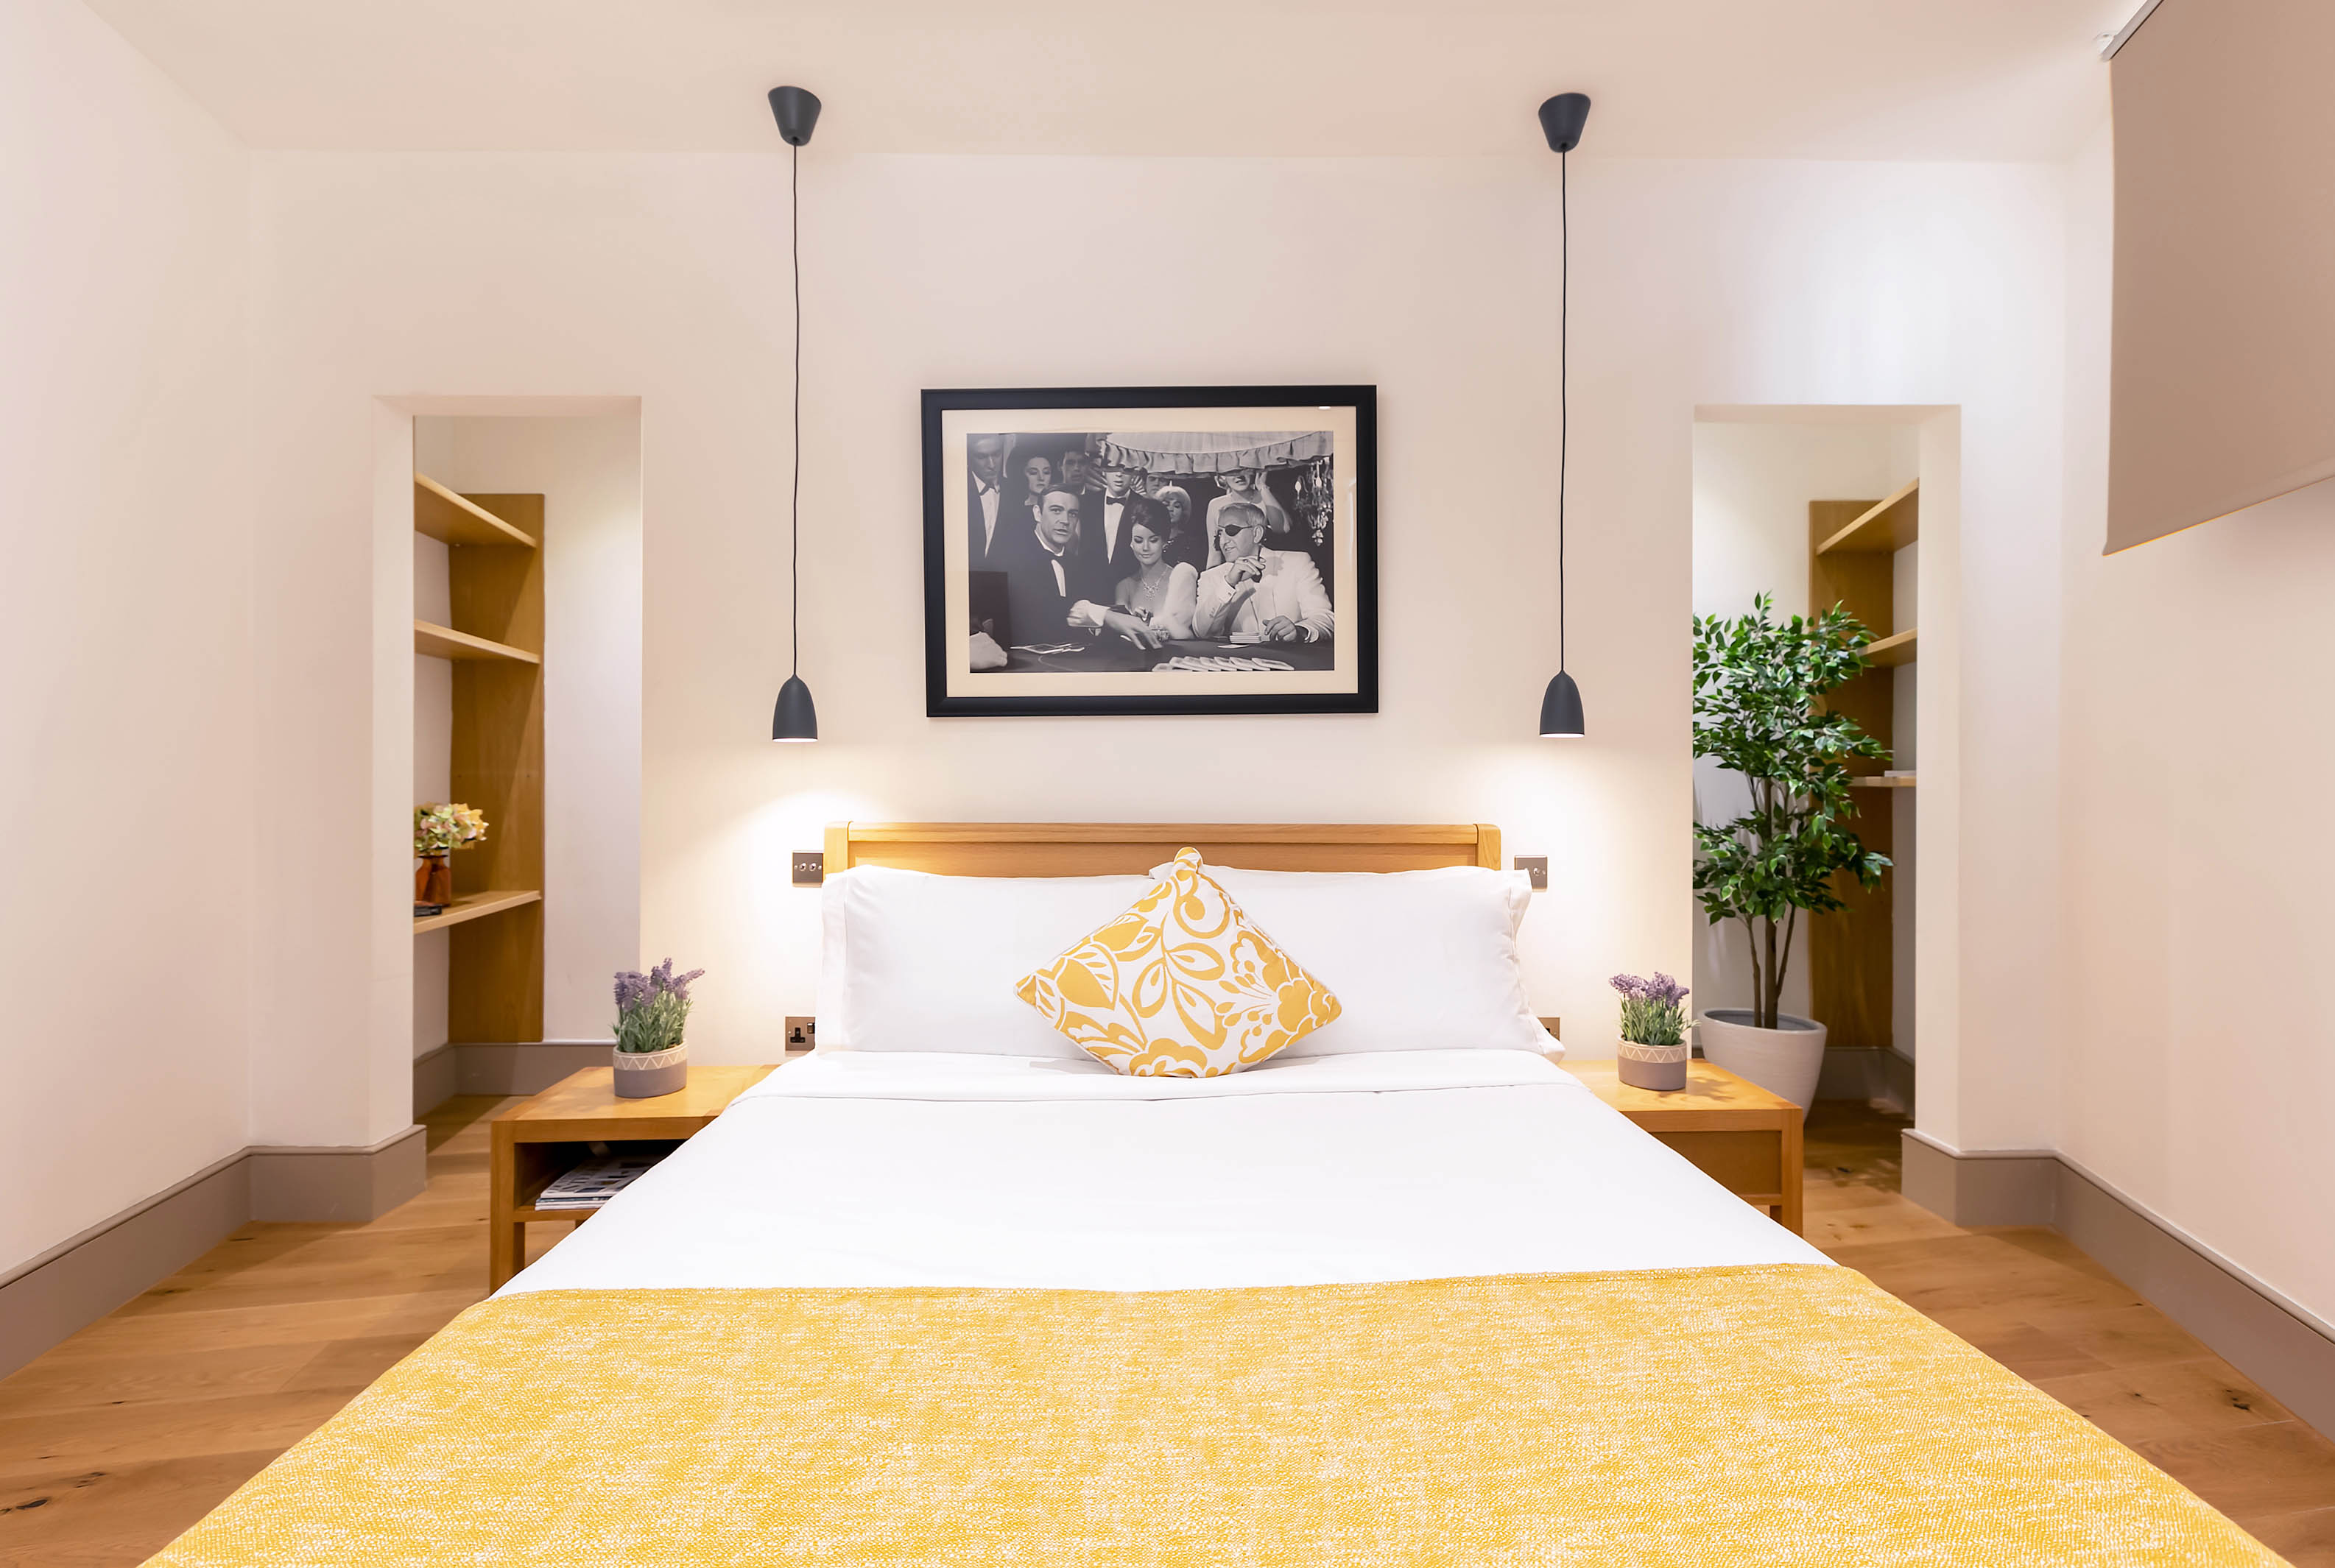 Lovelydays luxury service apartment rental - London - Fitzrovia - Wells Mews B - Lovelysuite - 2 bedrooms - 2 bathrooms - Double bed - 5cce42eeac5b - Lovelydays